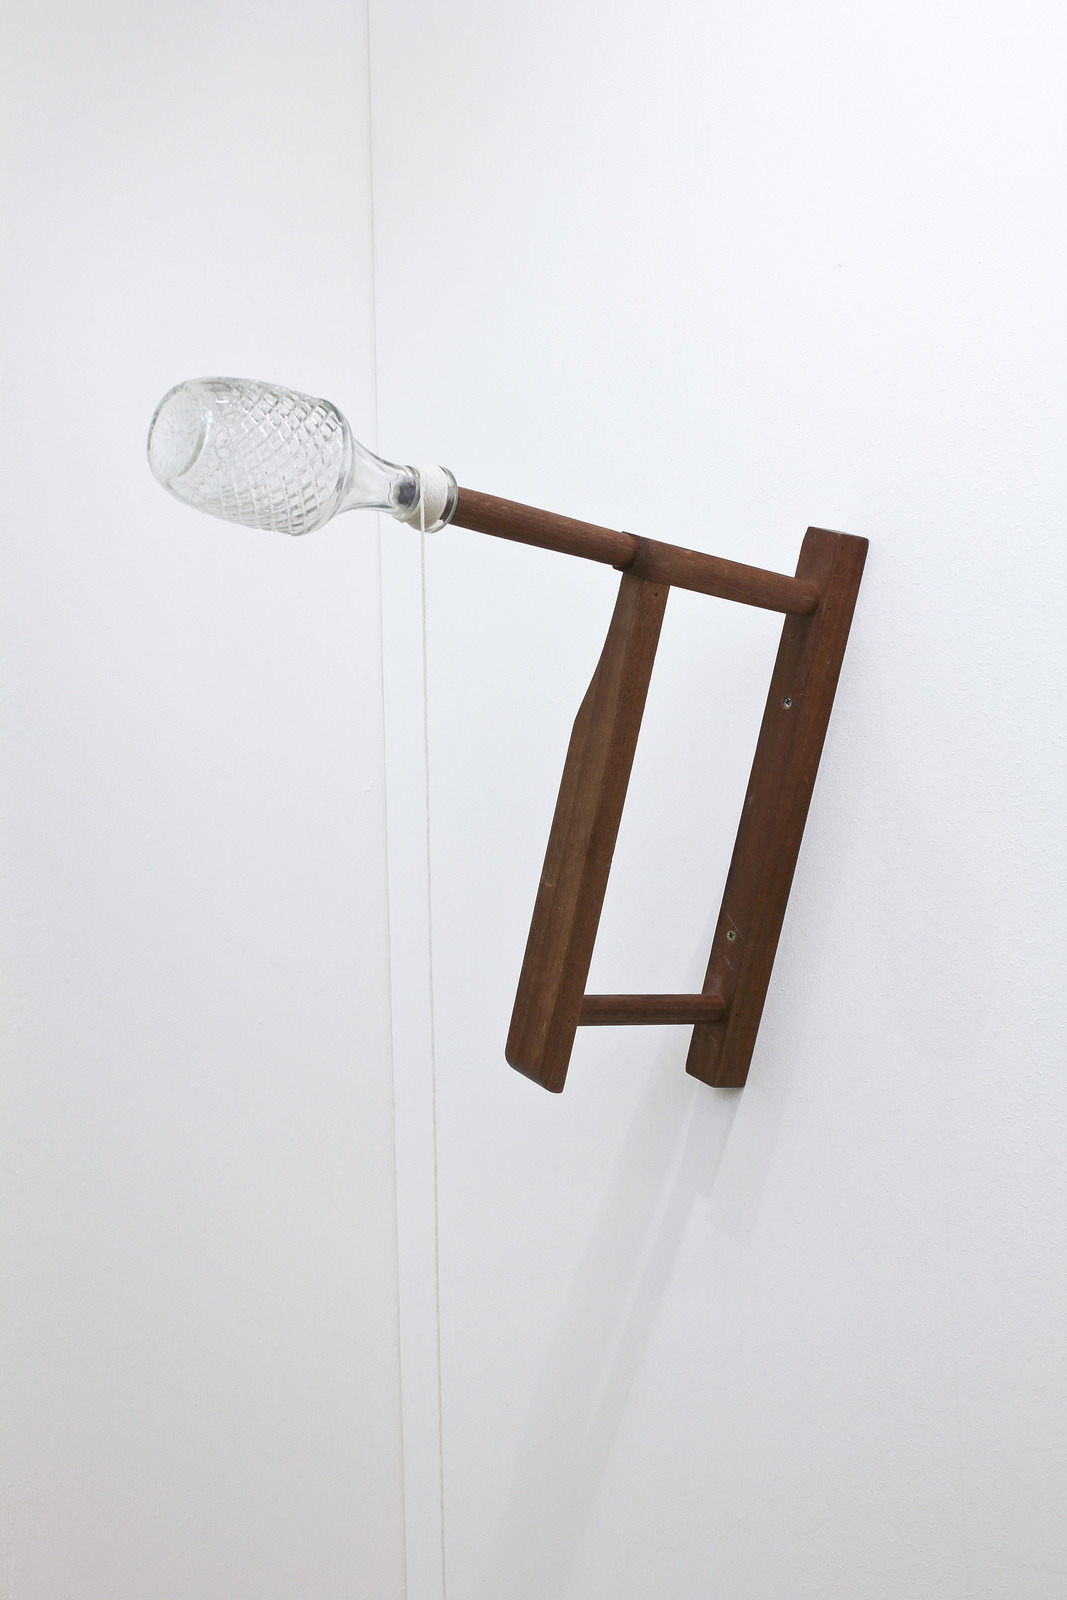 Amalia Pica at Stigter Van Doesburg, Amsterdam 01